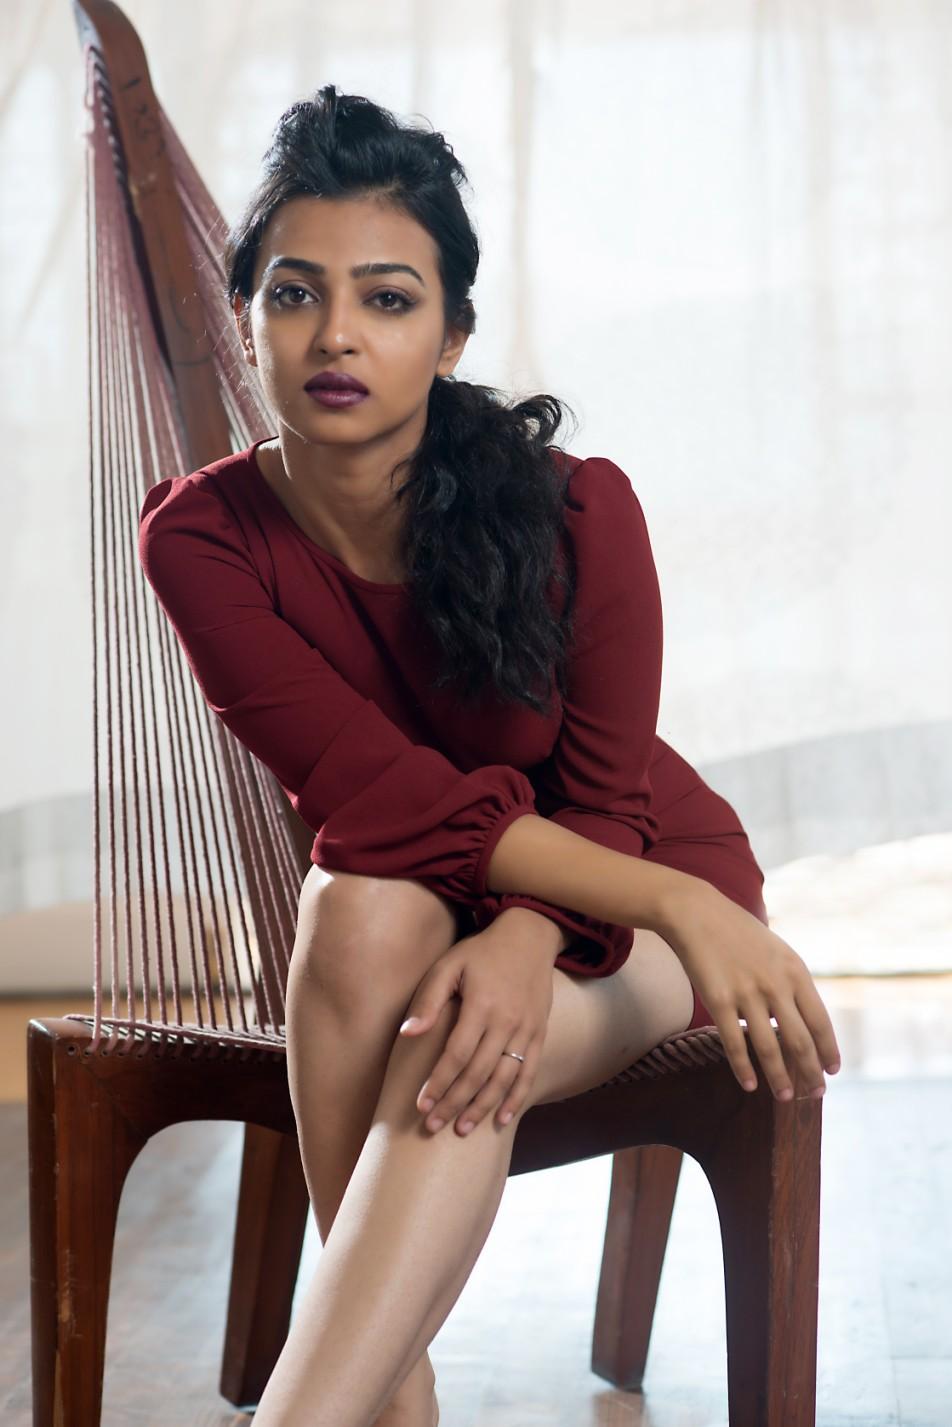 radhika-apte-selfie